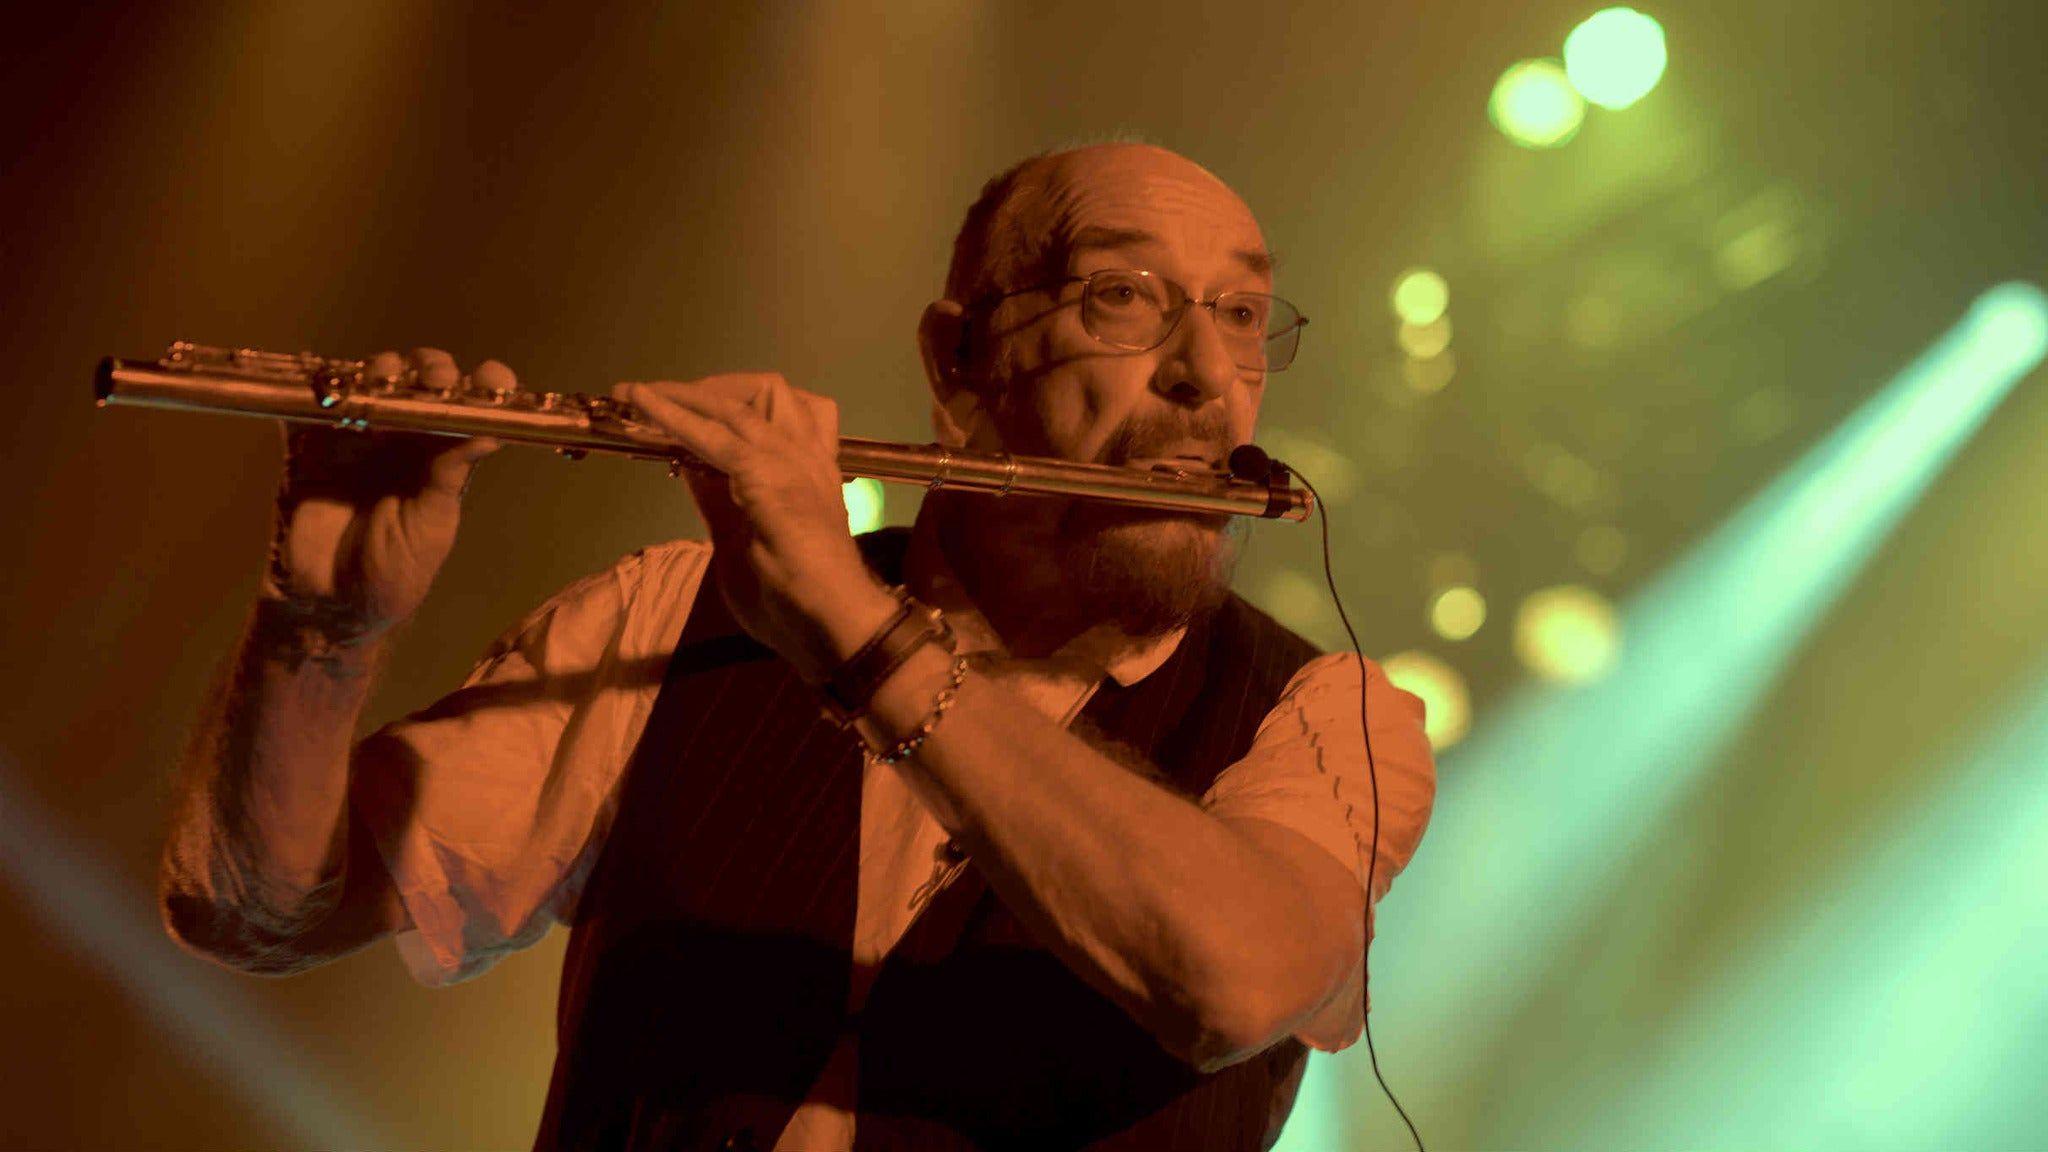 Jethro Tull -The Prog Years